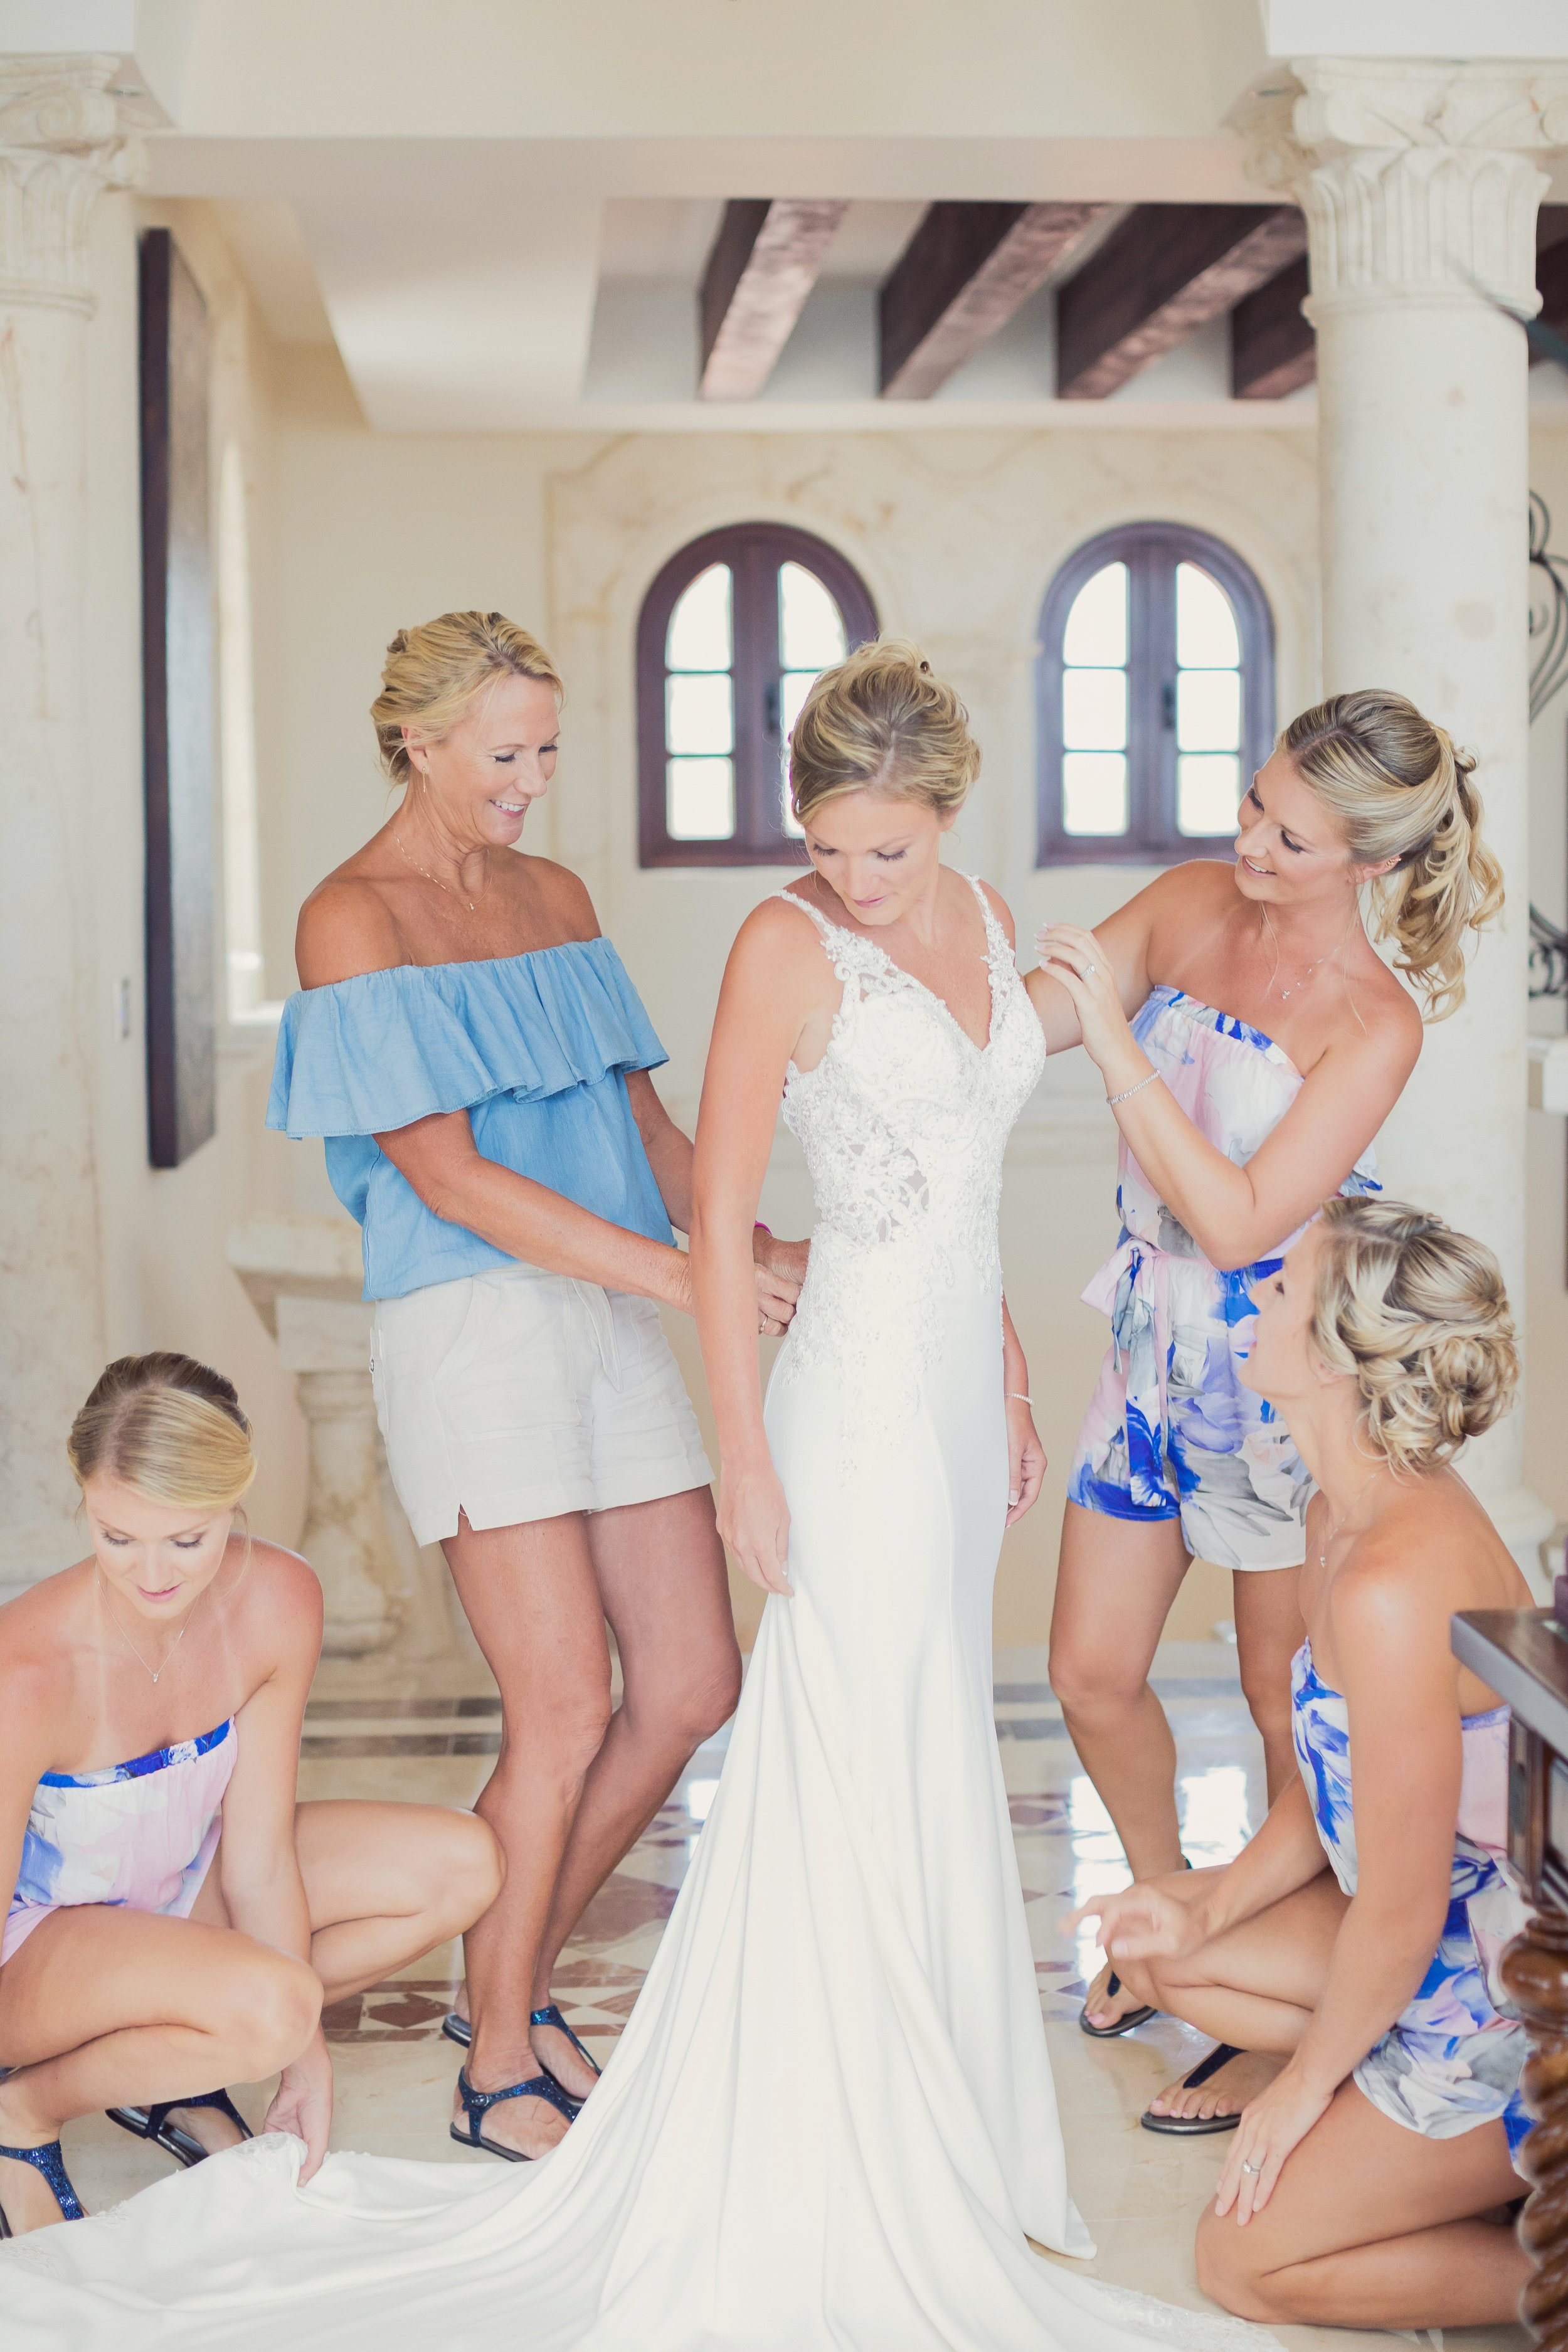 cancun-wedding-venue-villa-la-joya-31.jpg